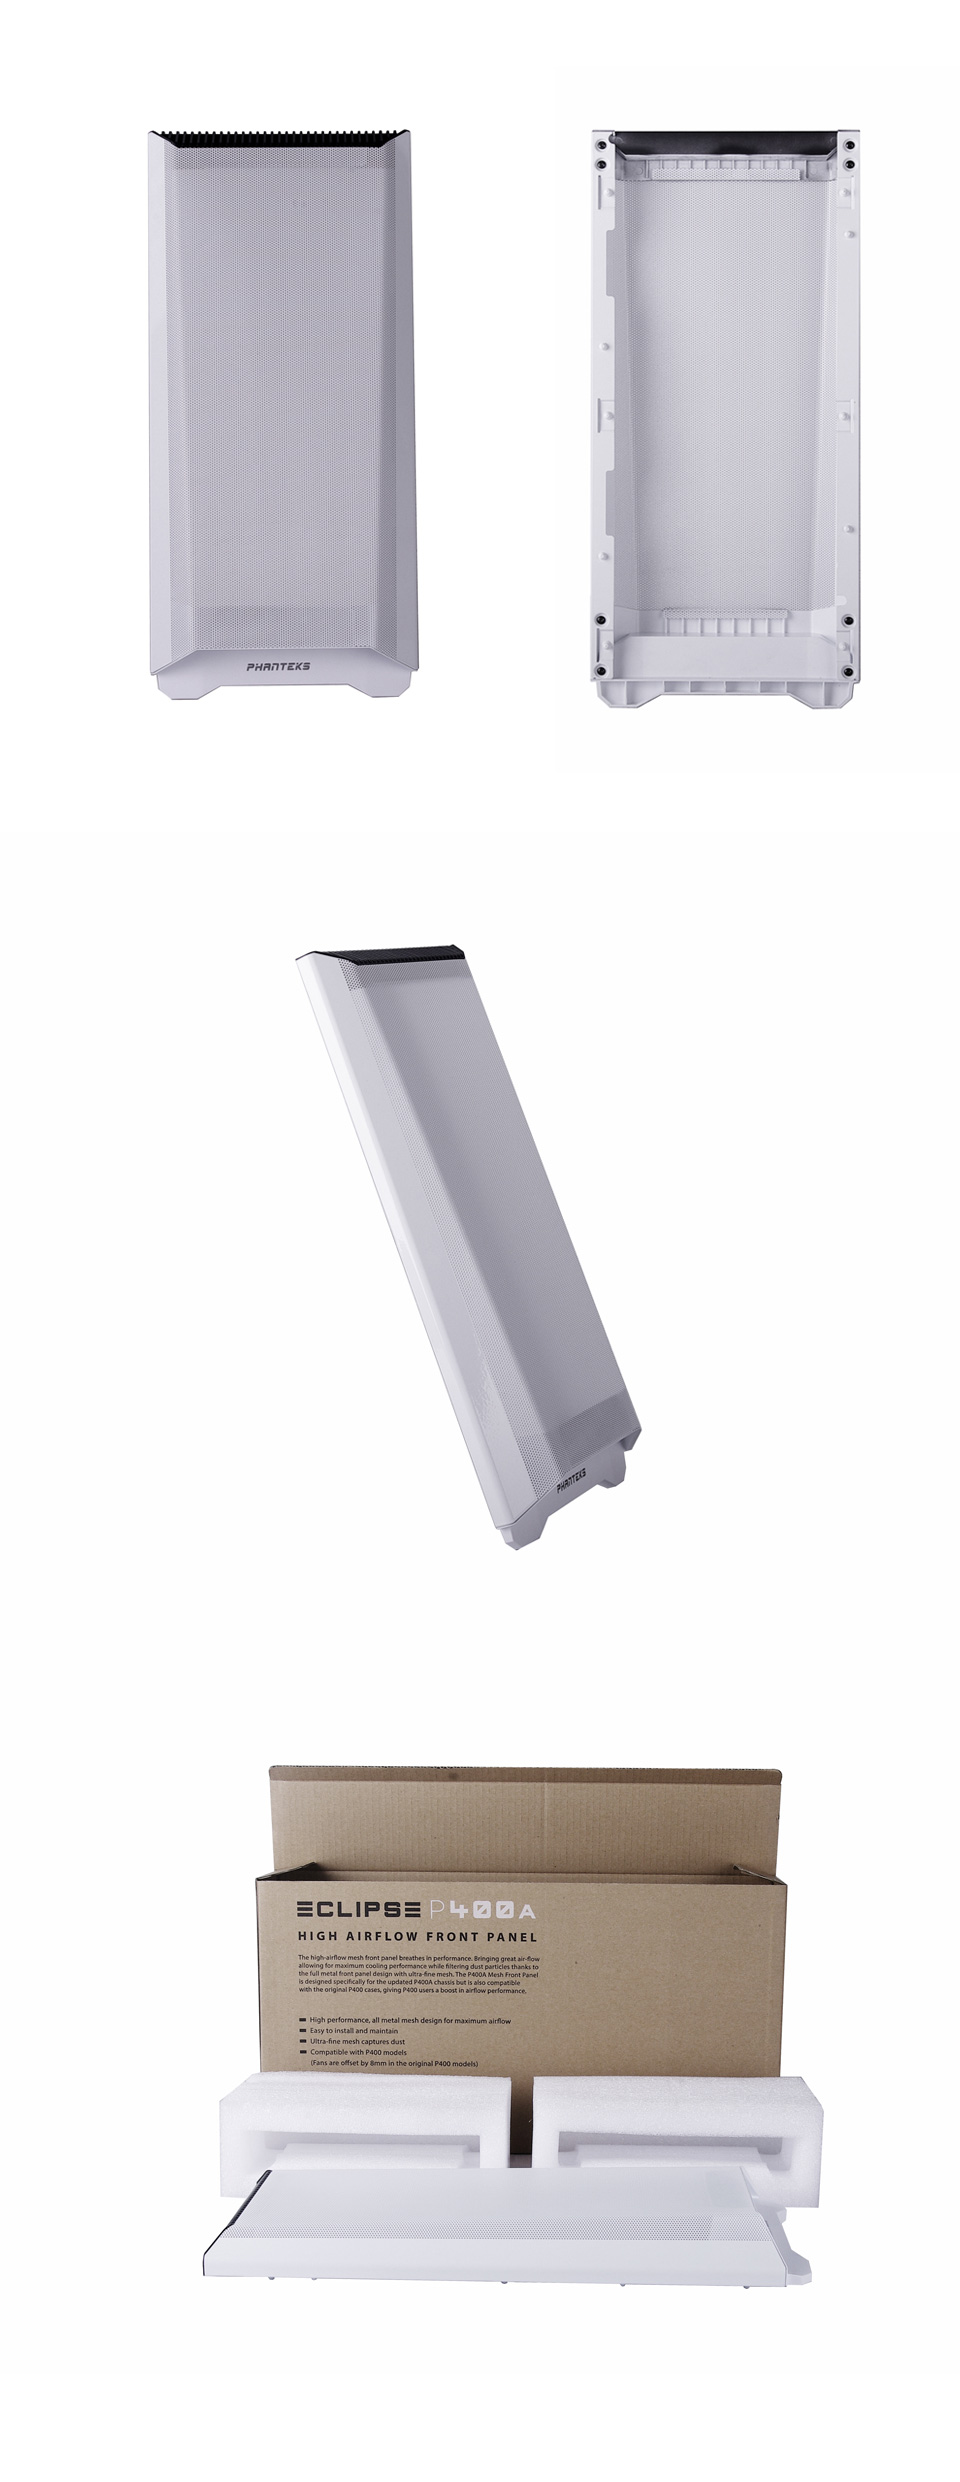 Phanteks Eclipse P400 Air Metal Front Panel White product